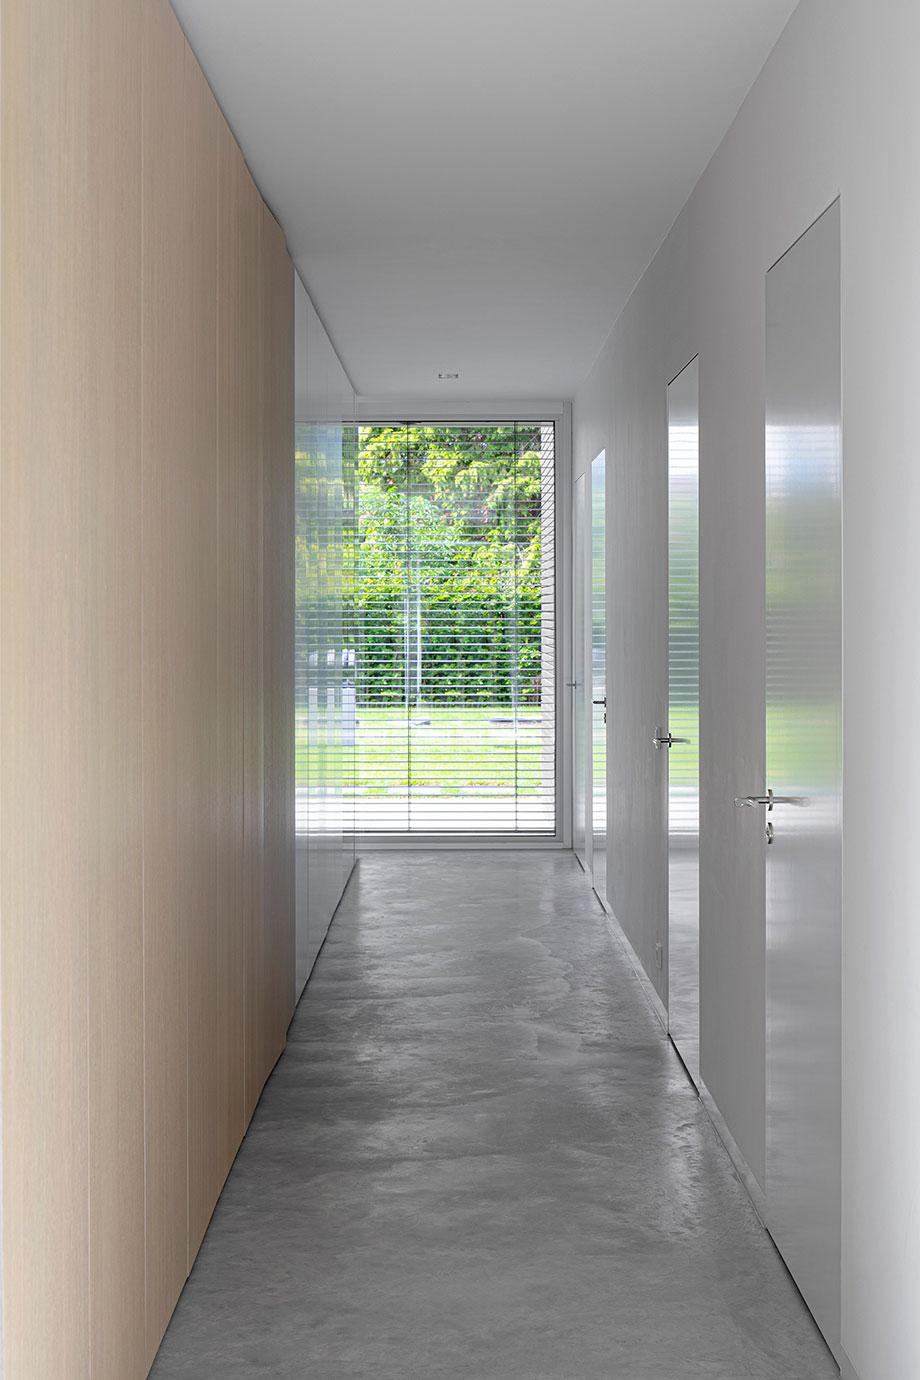 casa de i29 y bedaux de brouwer (4) - foto ewout huibers